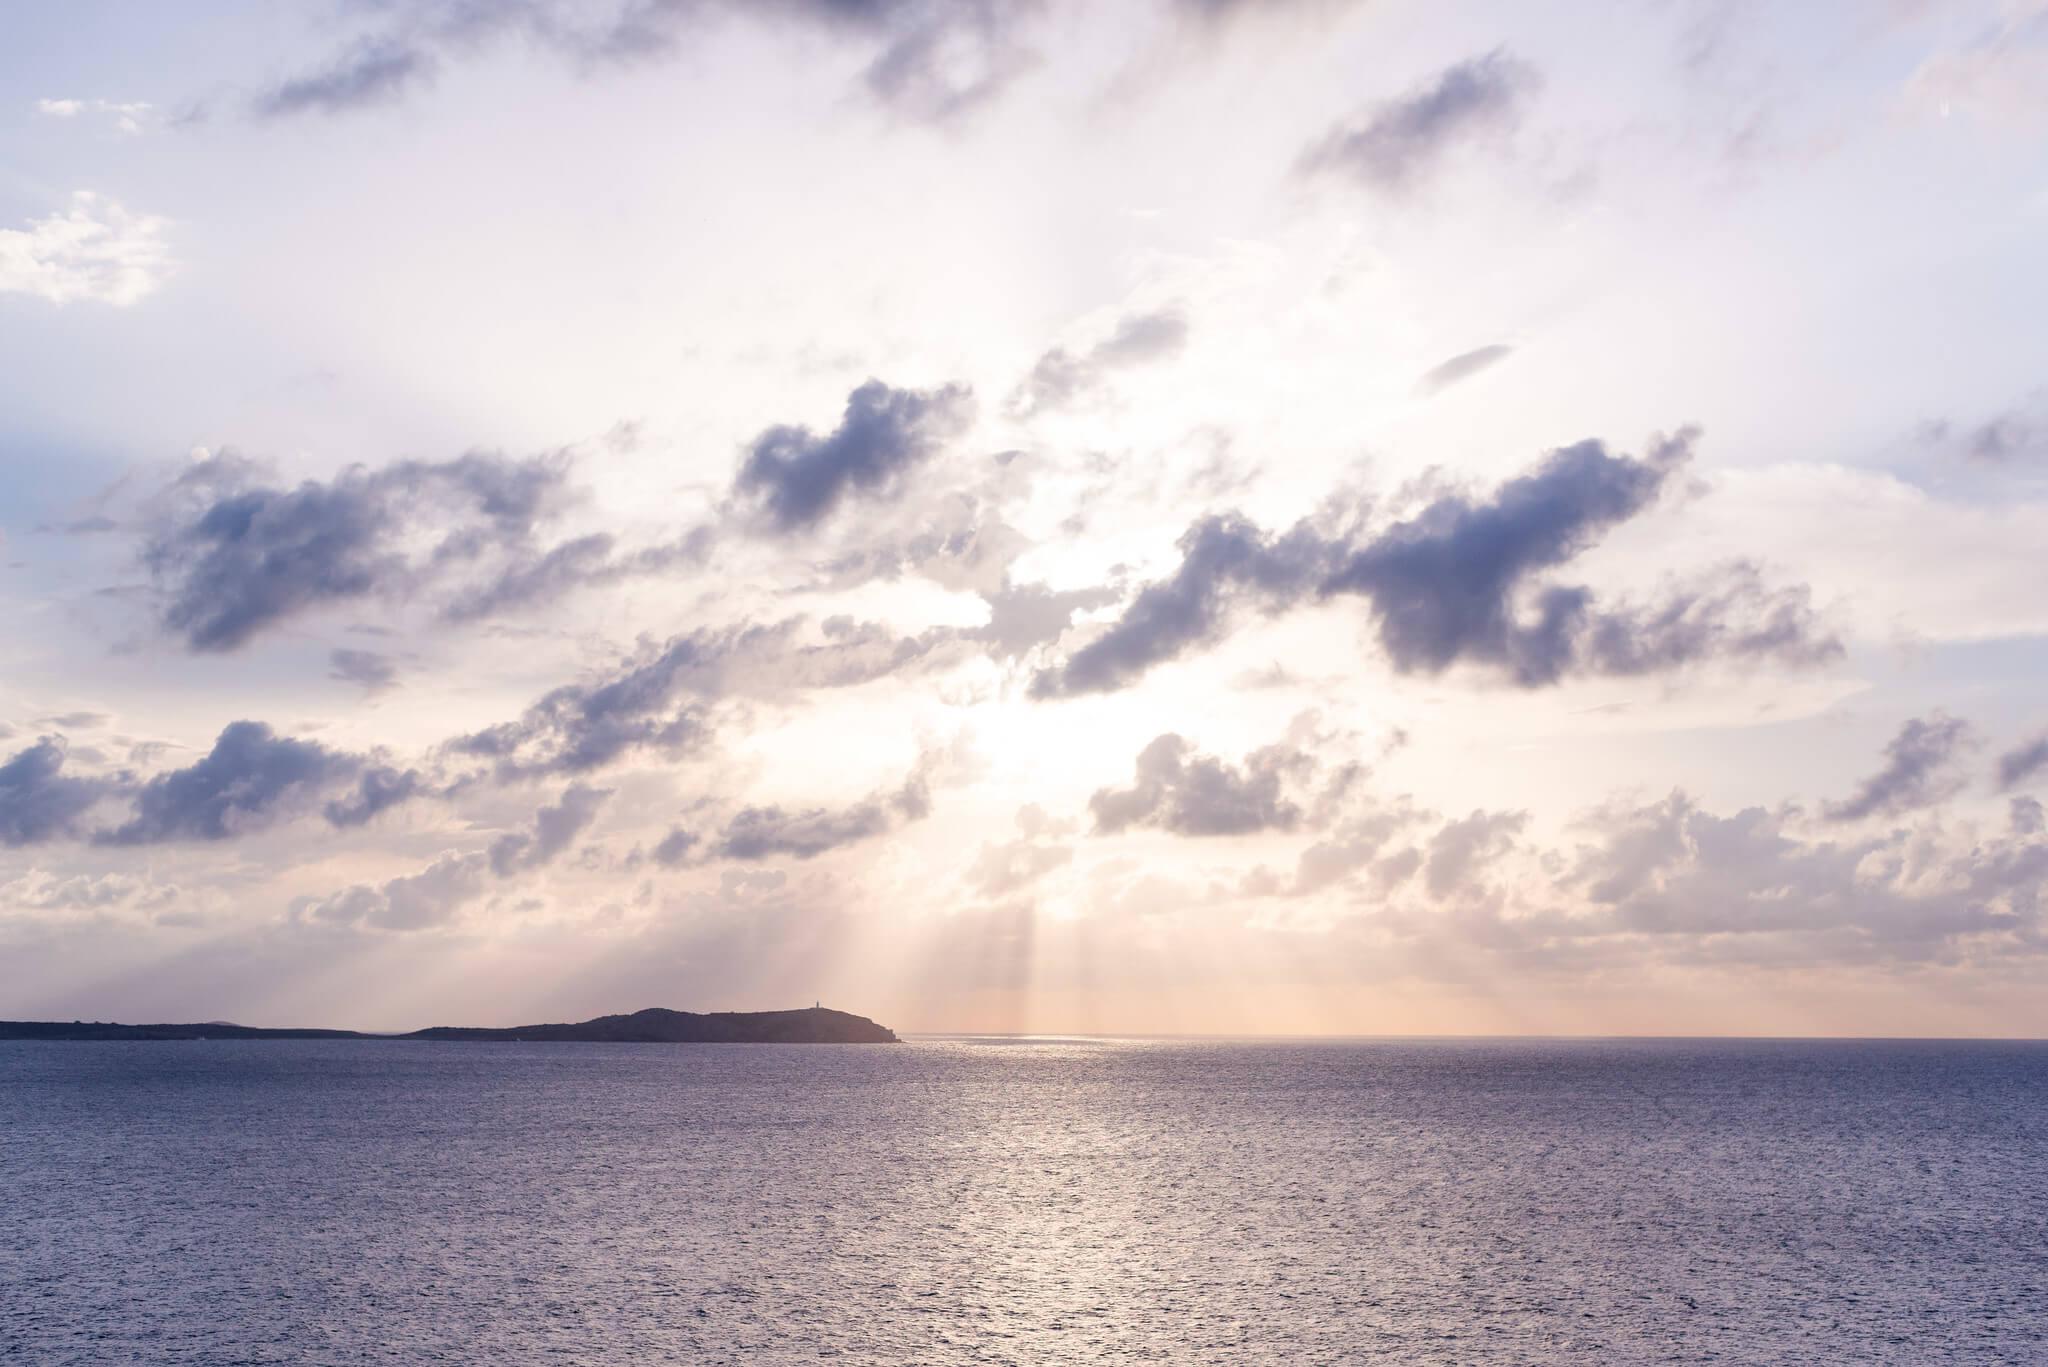 https://www.white-ibiza.com/wp-content/uploads/2020/03/ibiza-sunsets-la-torre-ibiza-2020-04.jpg